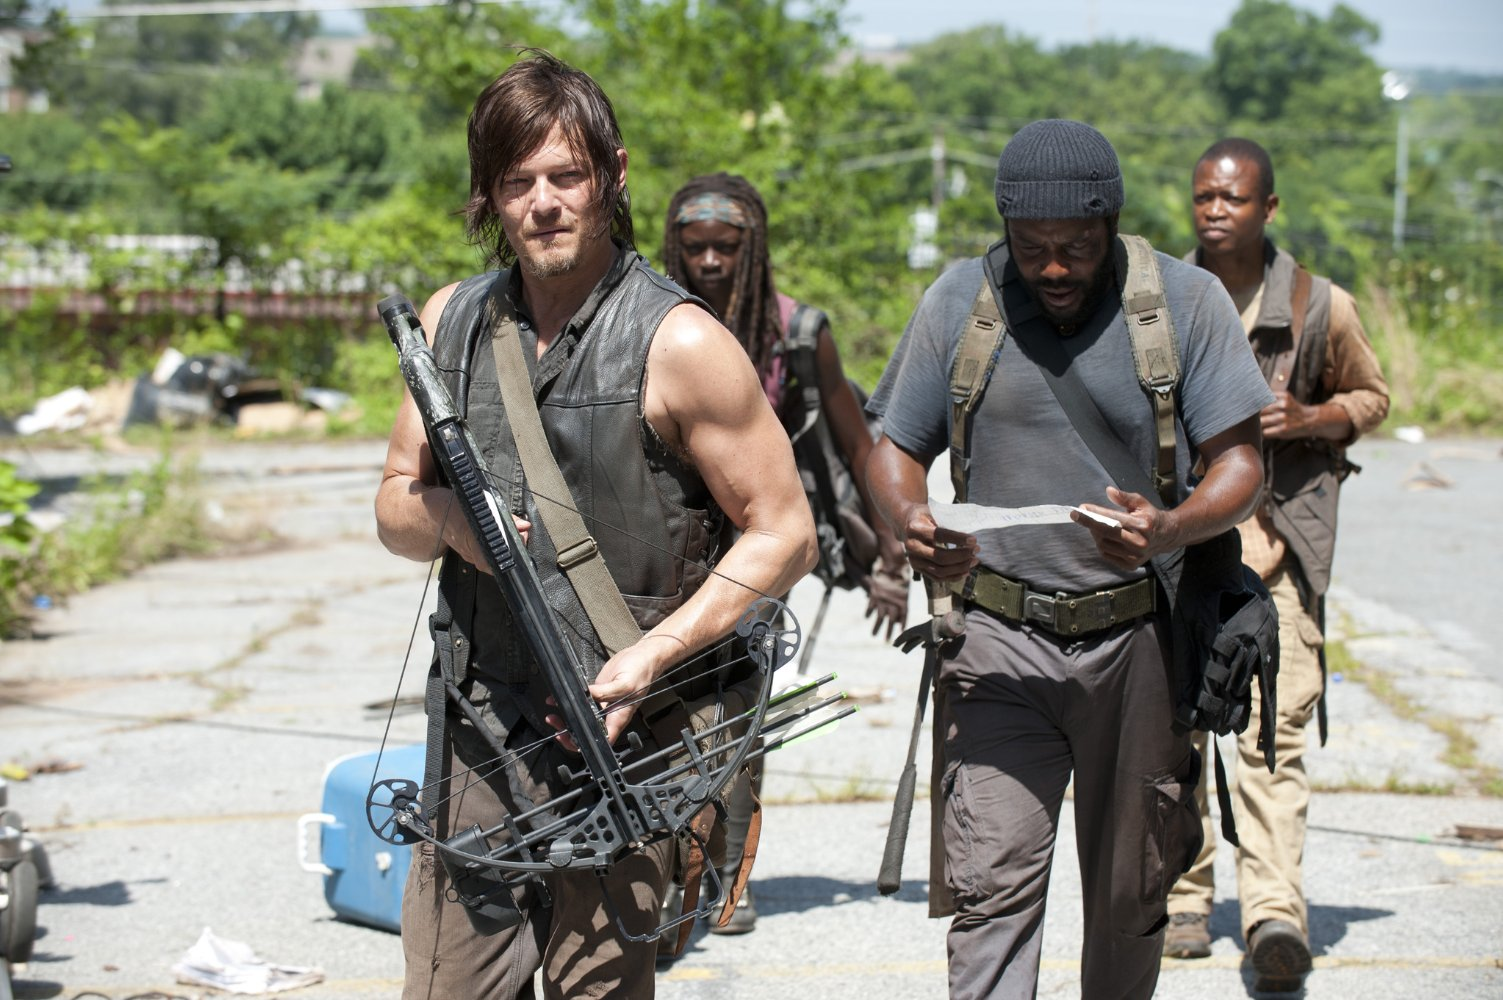 Nonton Film The Walking Dead S04E04: Indifference (2013)